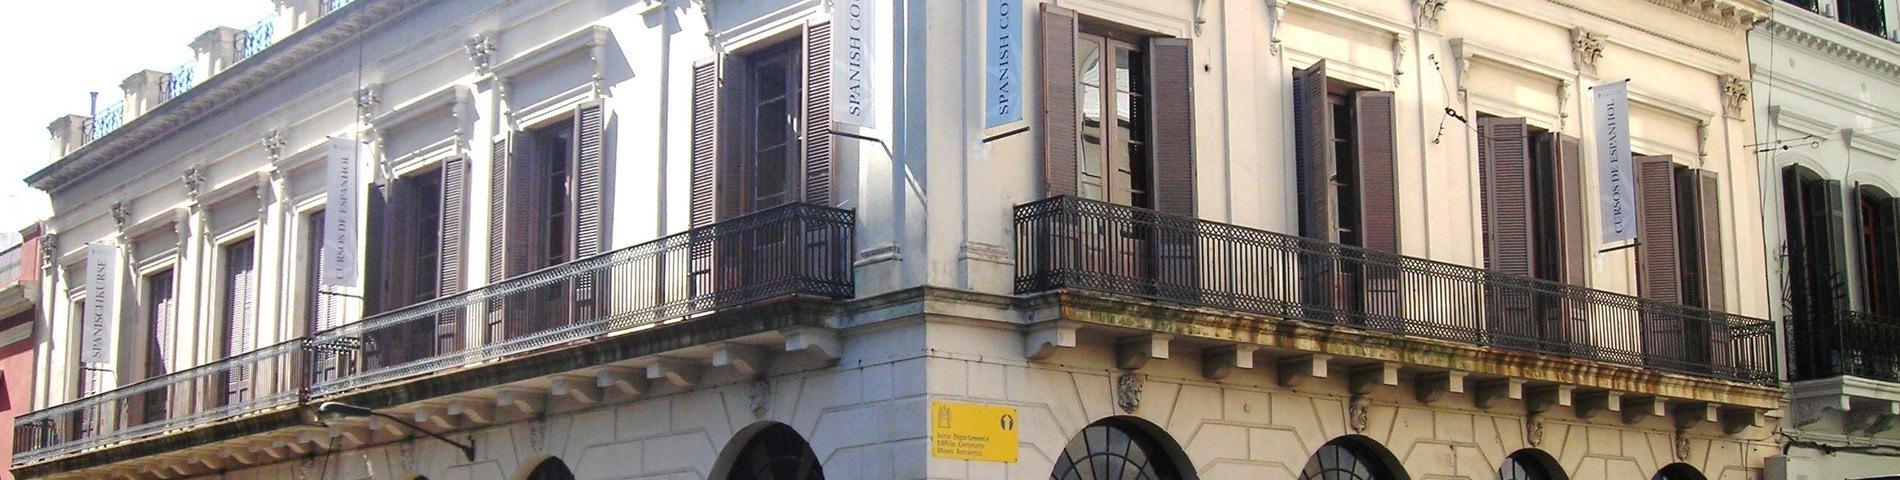 Academia Uruguay picture 1